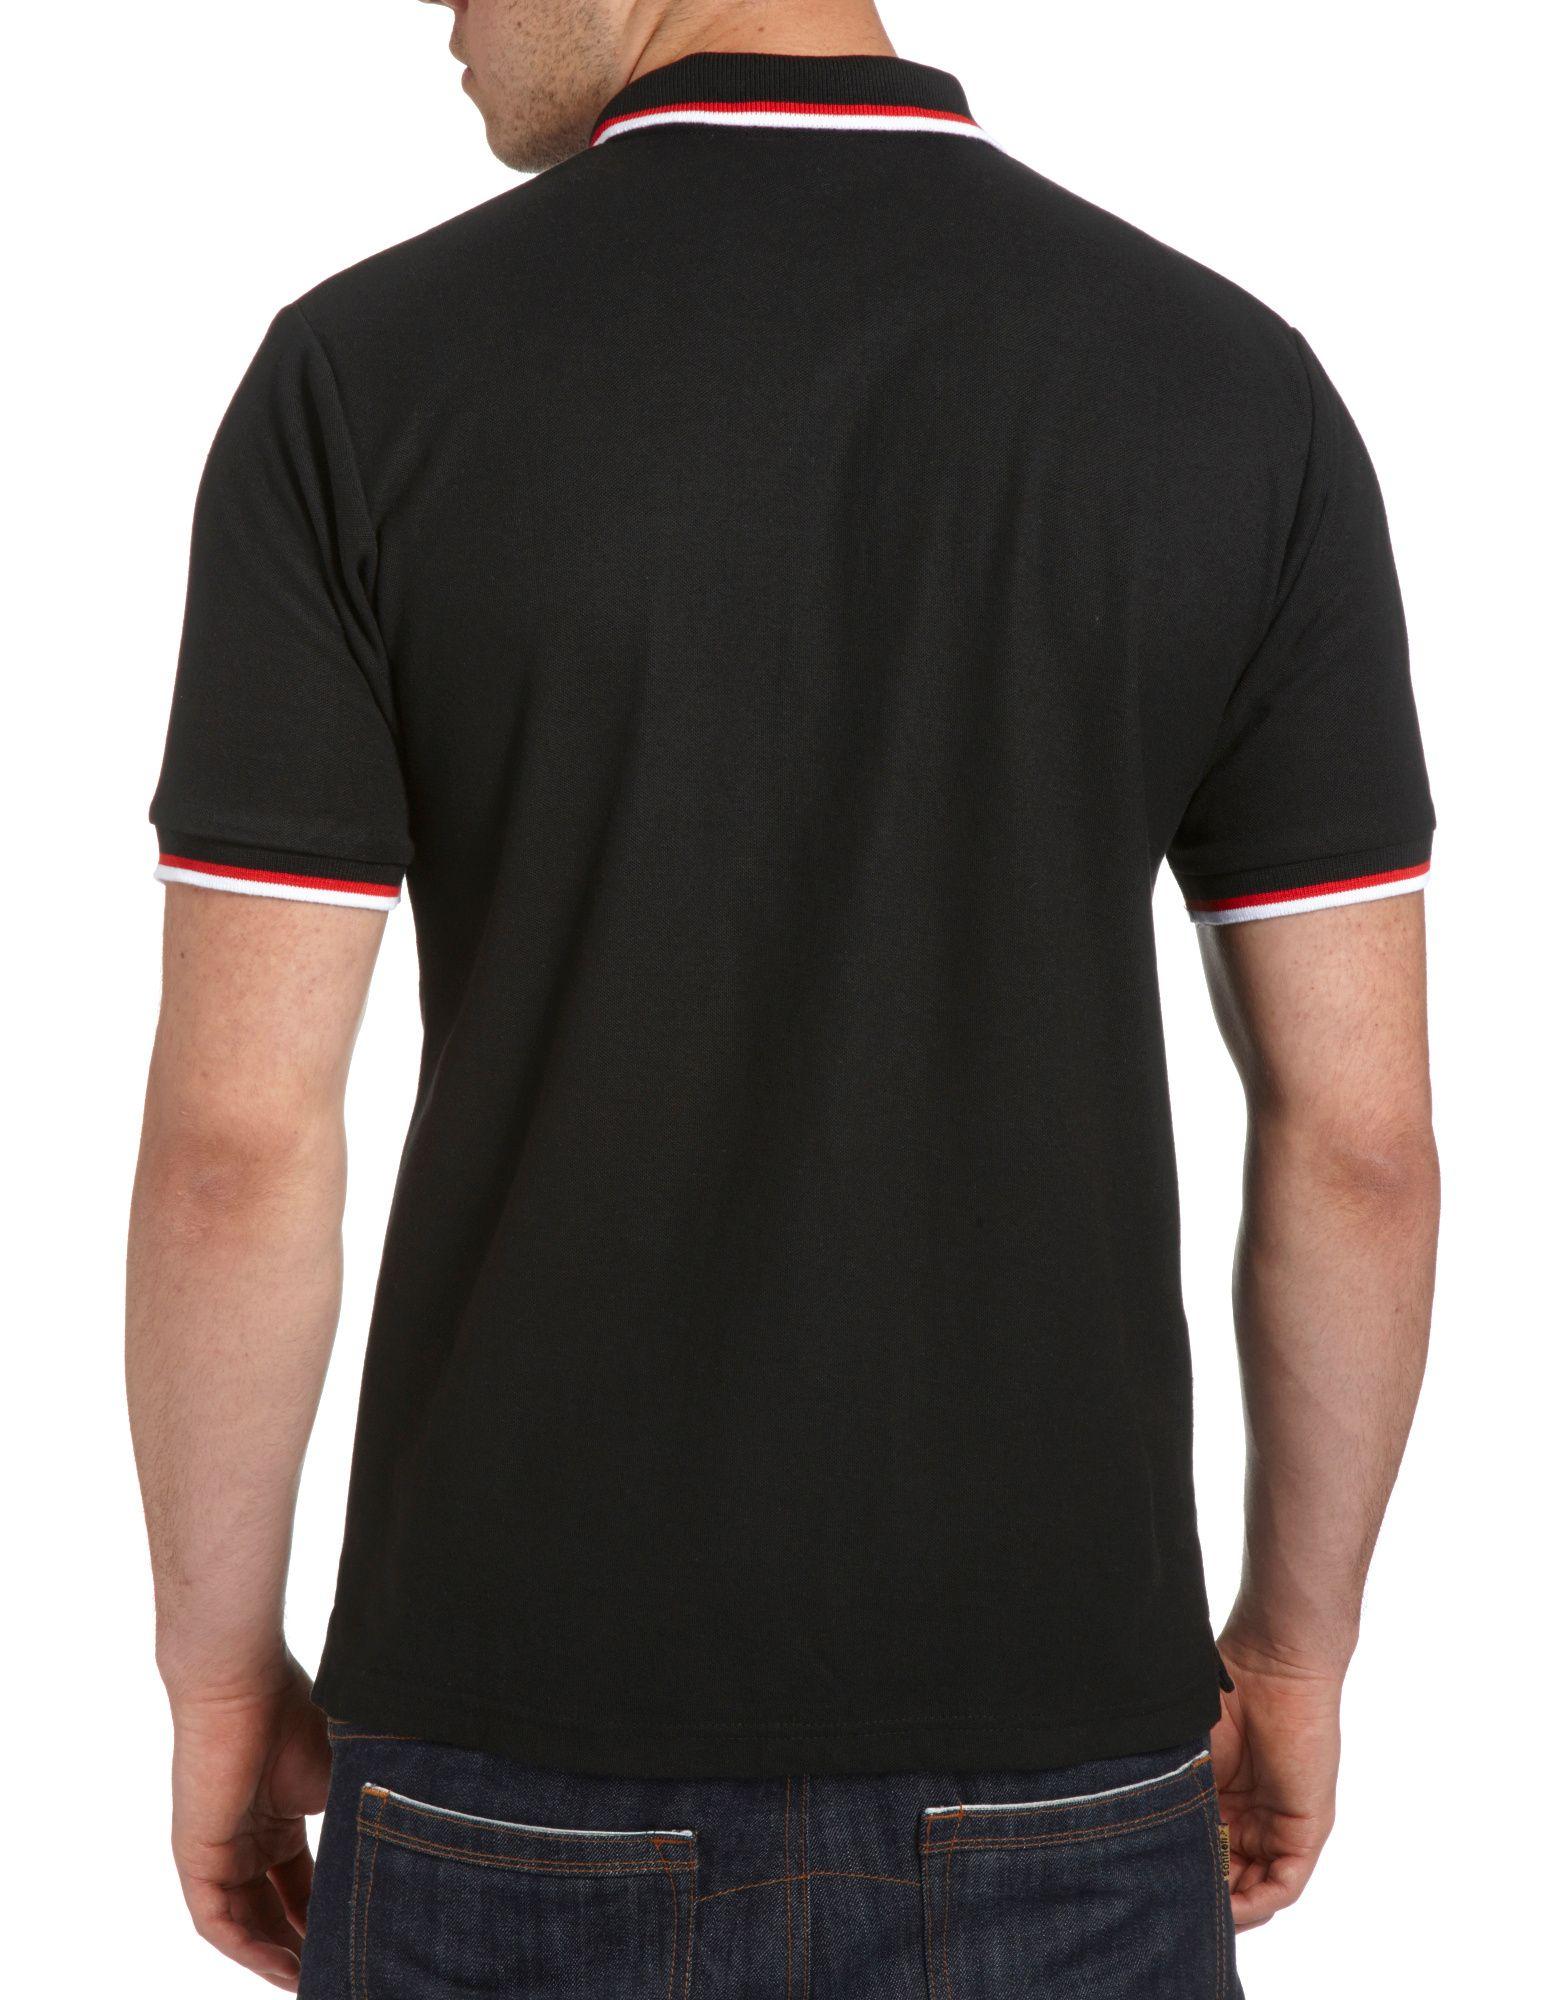 Official Team Liverpool Polo Shirt